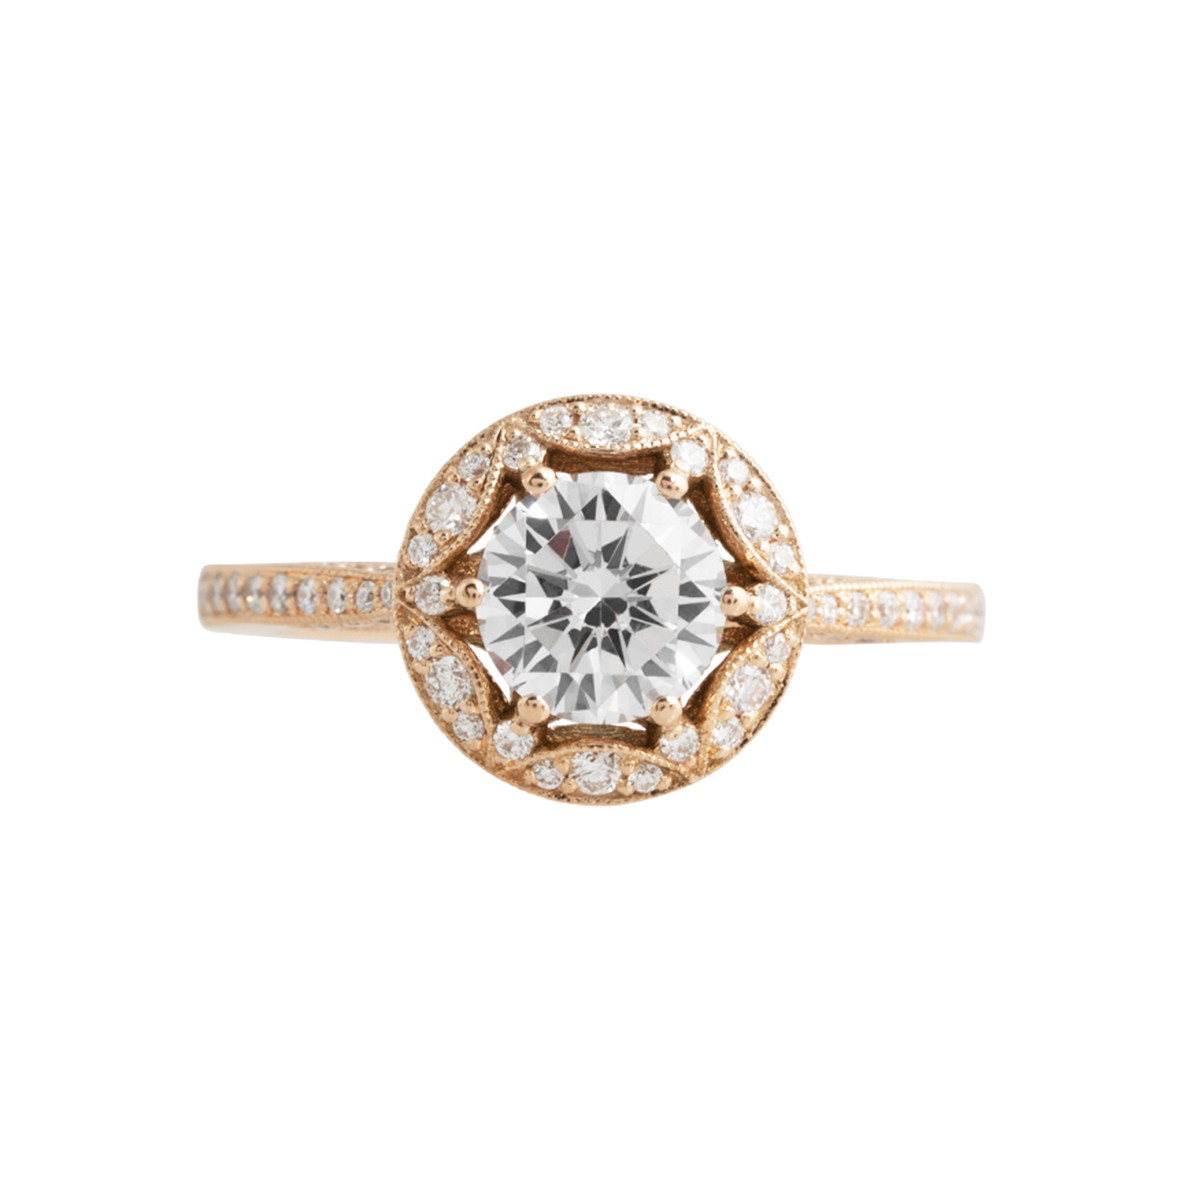 Vintage Tacori 0.33 CTW Diamond Halo Engagement Ring